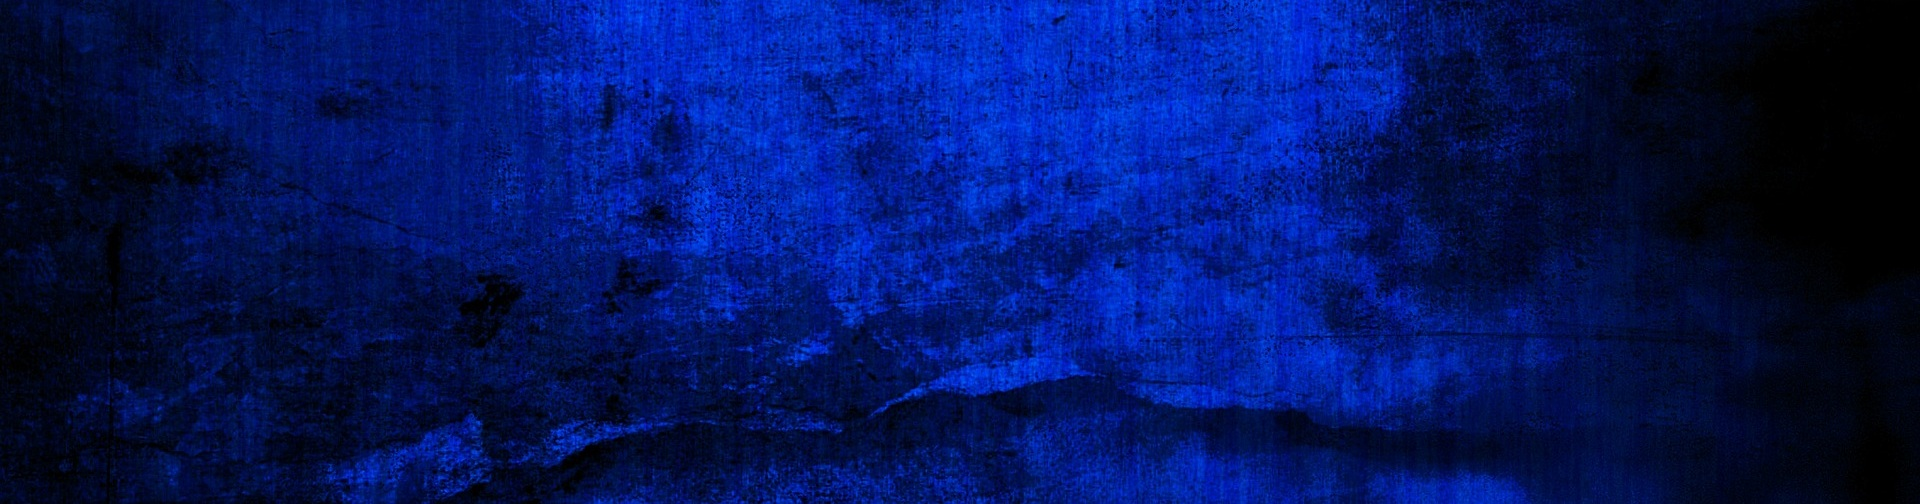 texture-1762532_1920.jpg